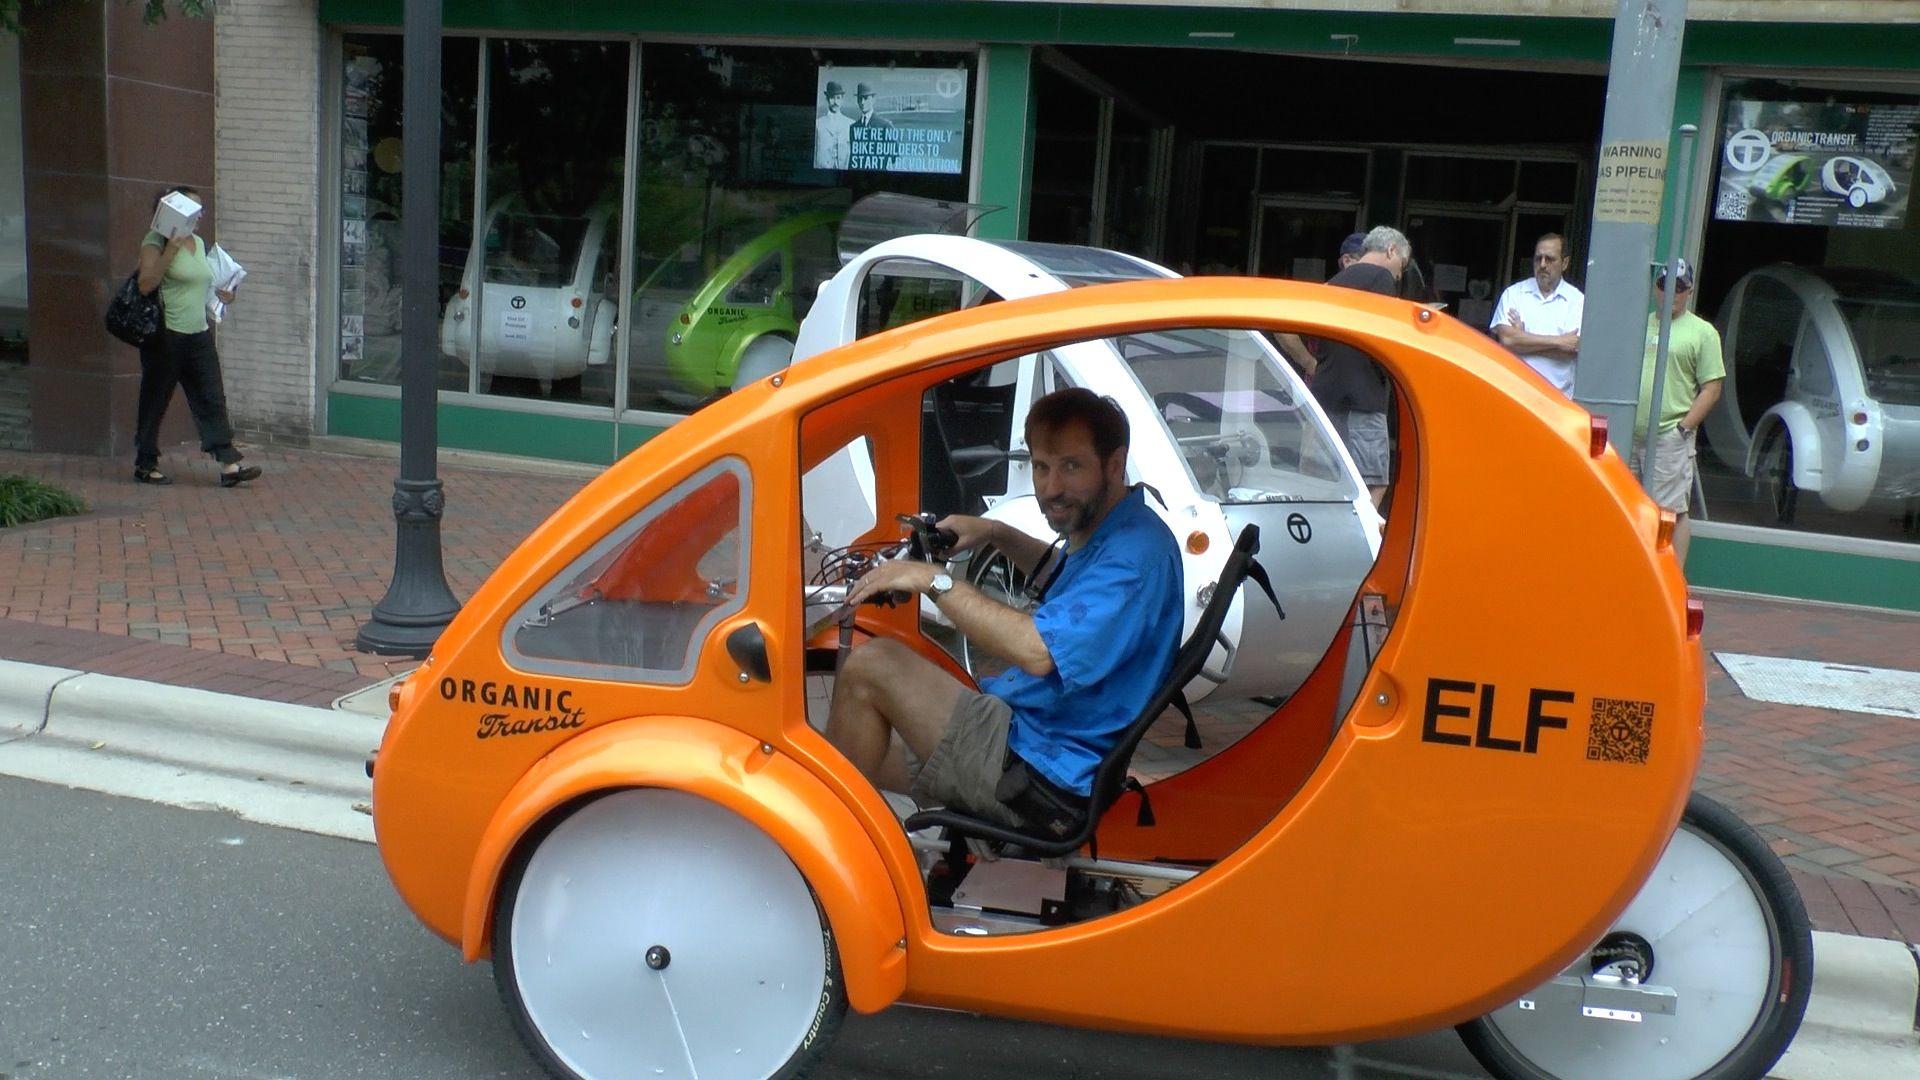 Organic Transit's Enclosed Tricycle Is Half Bike, Half Car